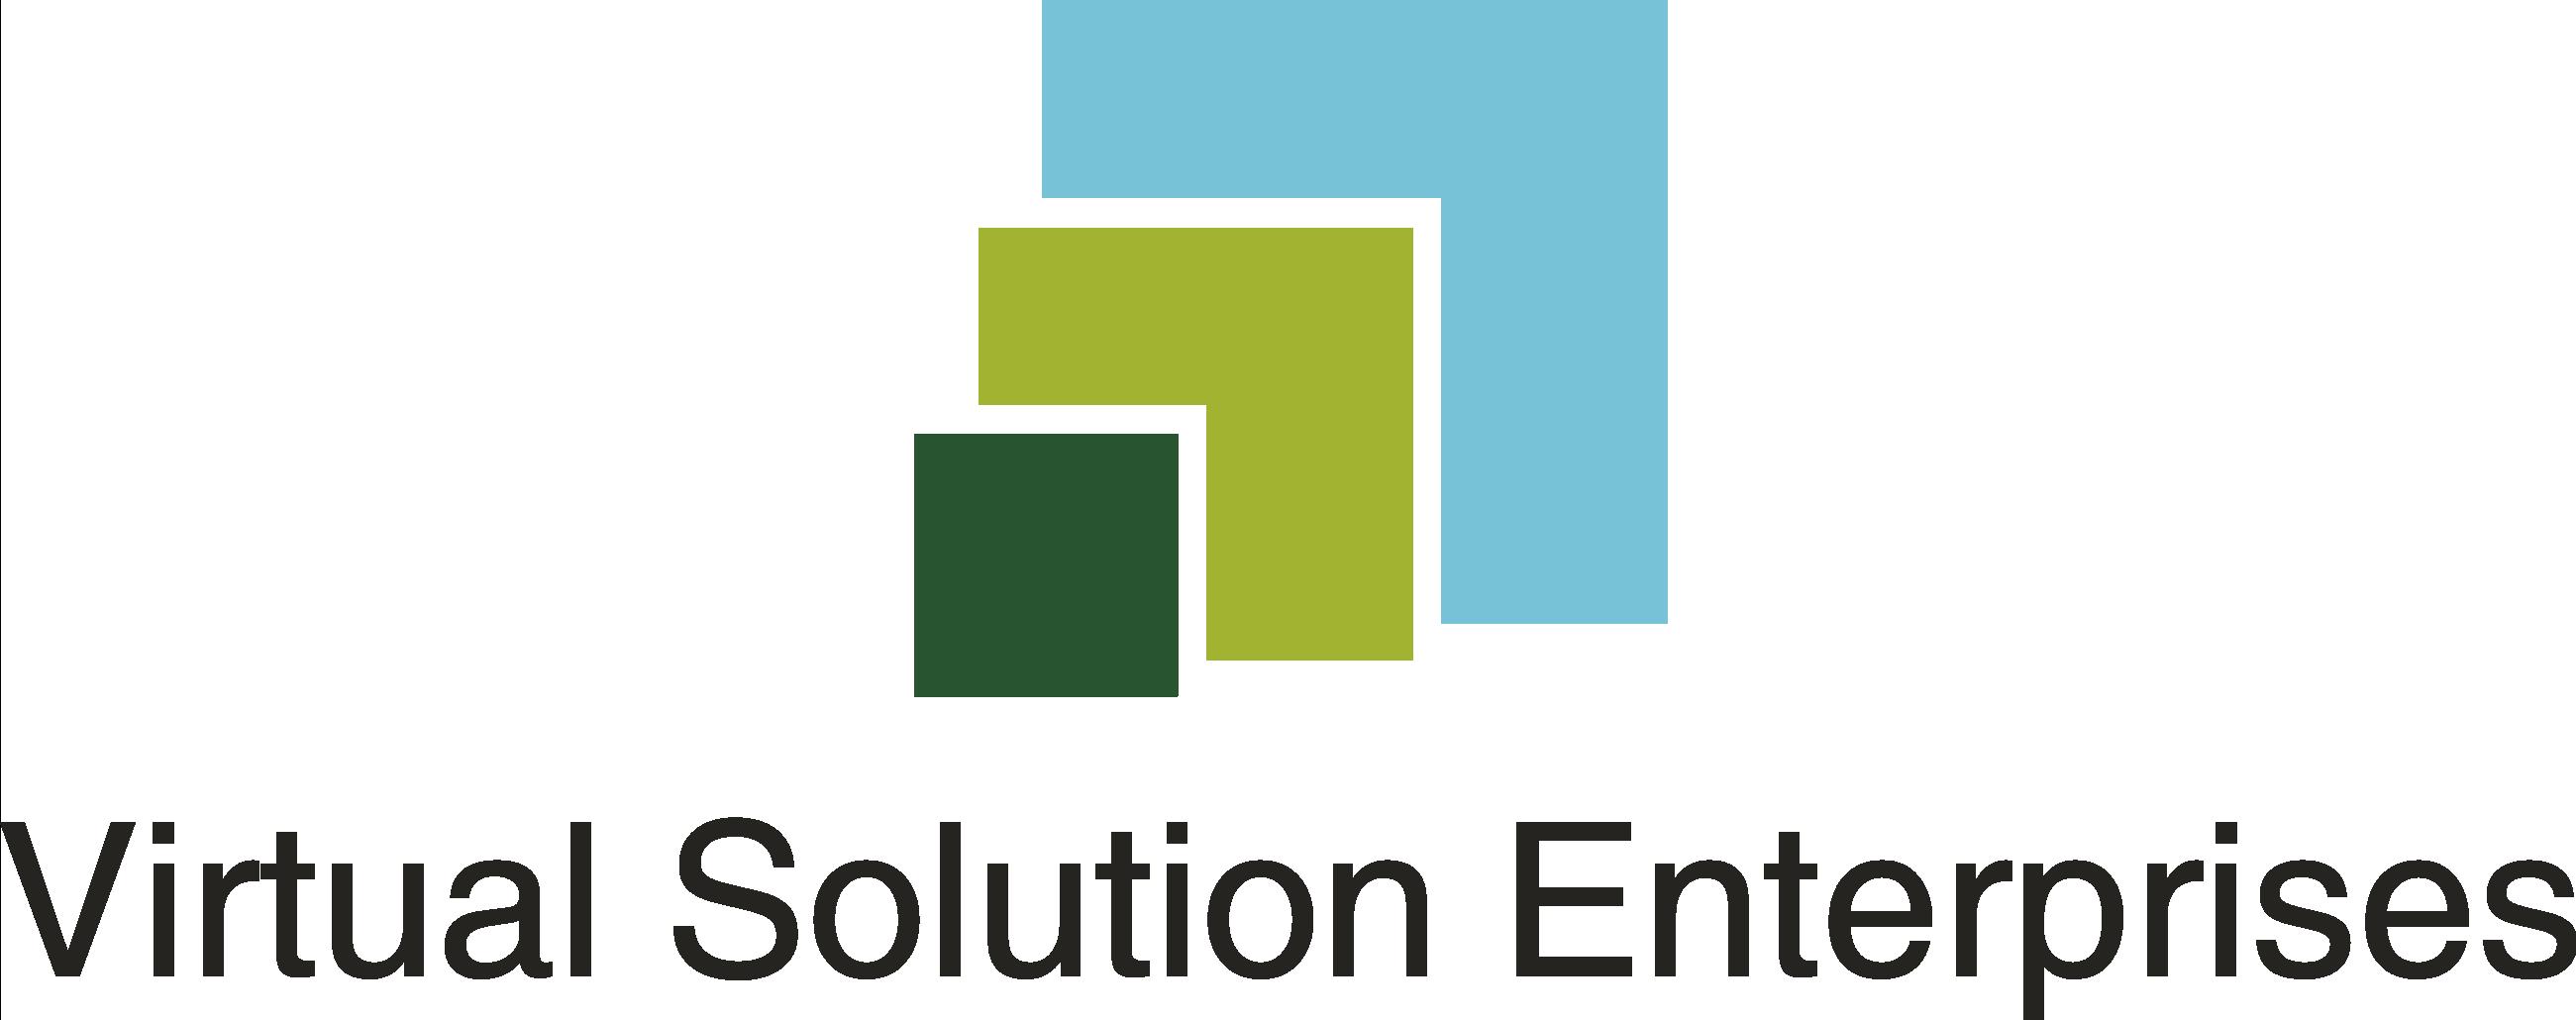 Virtual Solution Enterprises